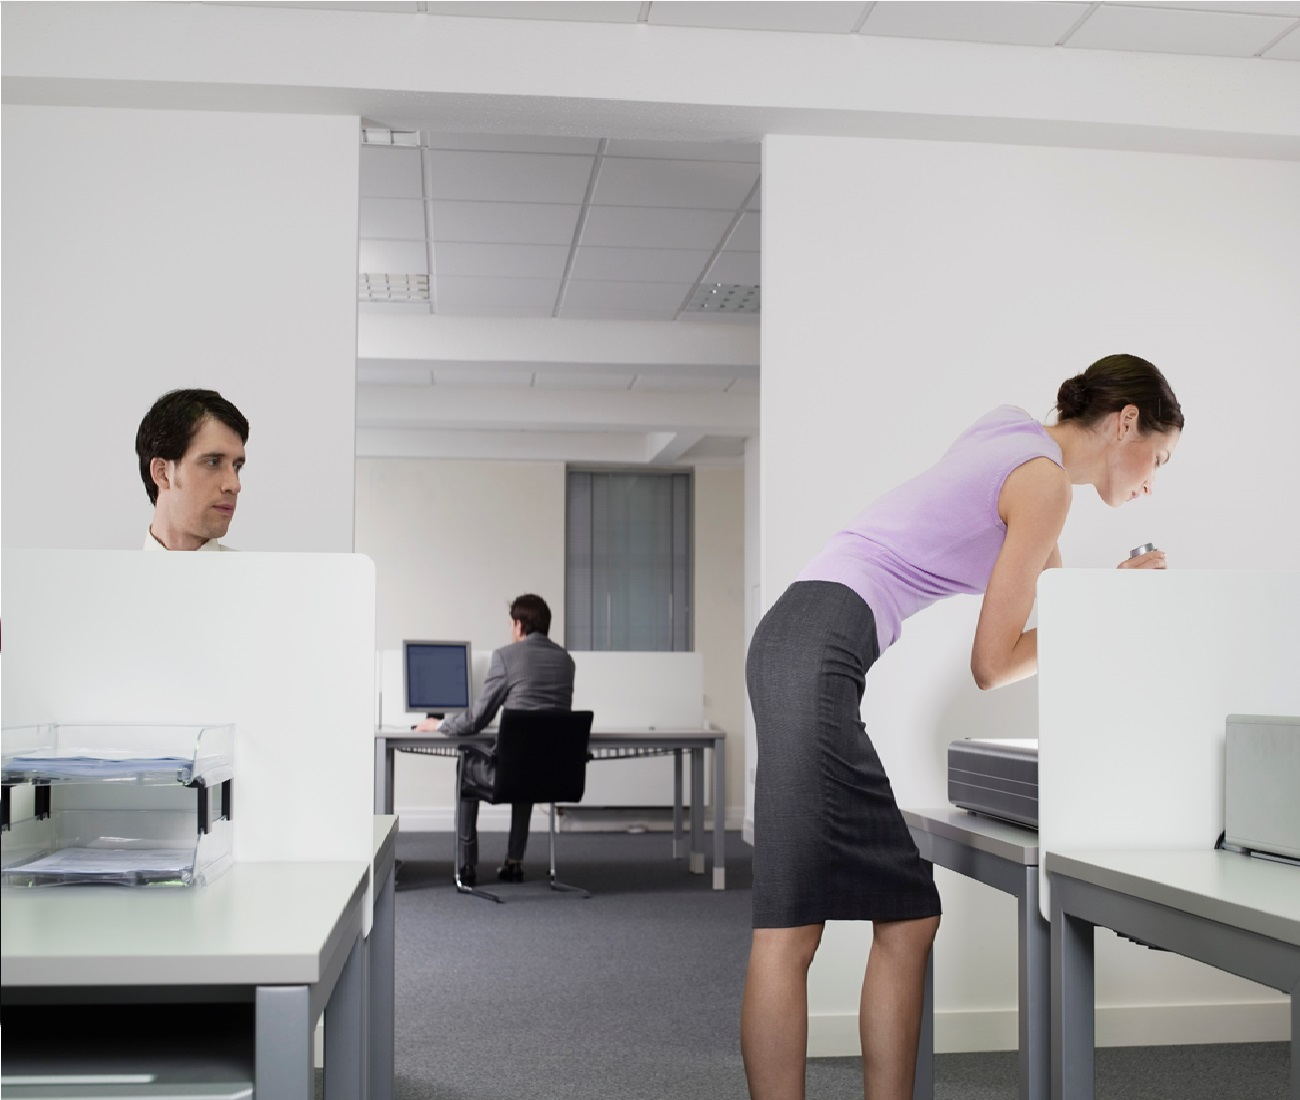 Get Better Workplace Safety Training | SafetyNow ILT